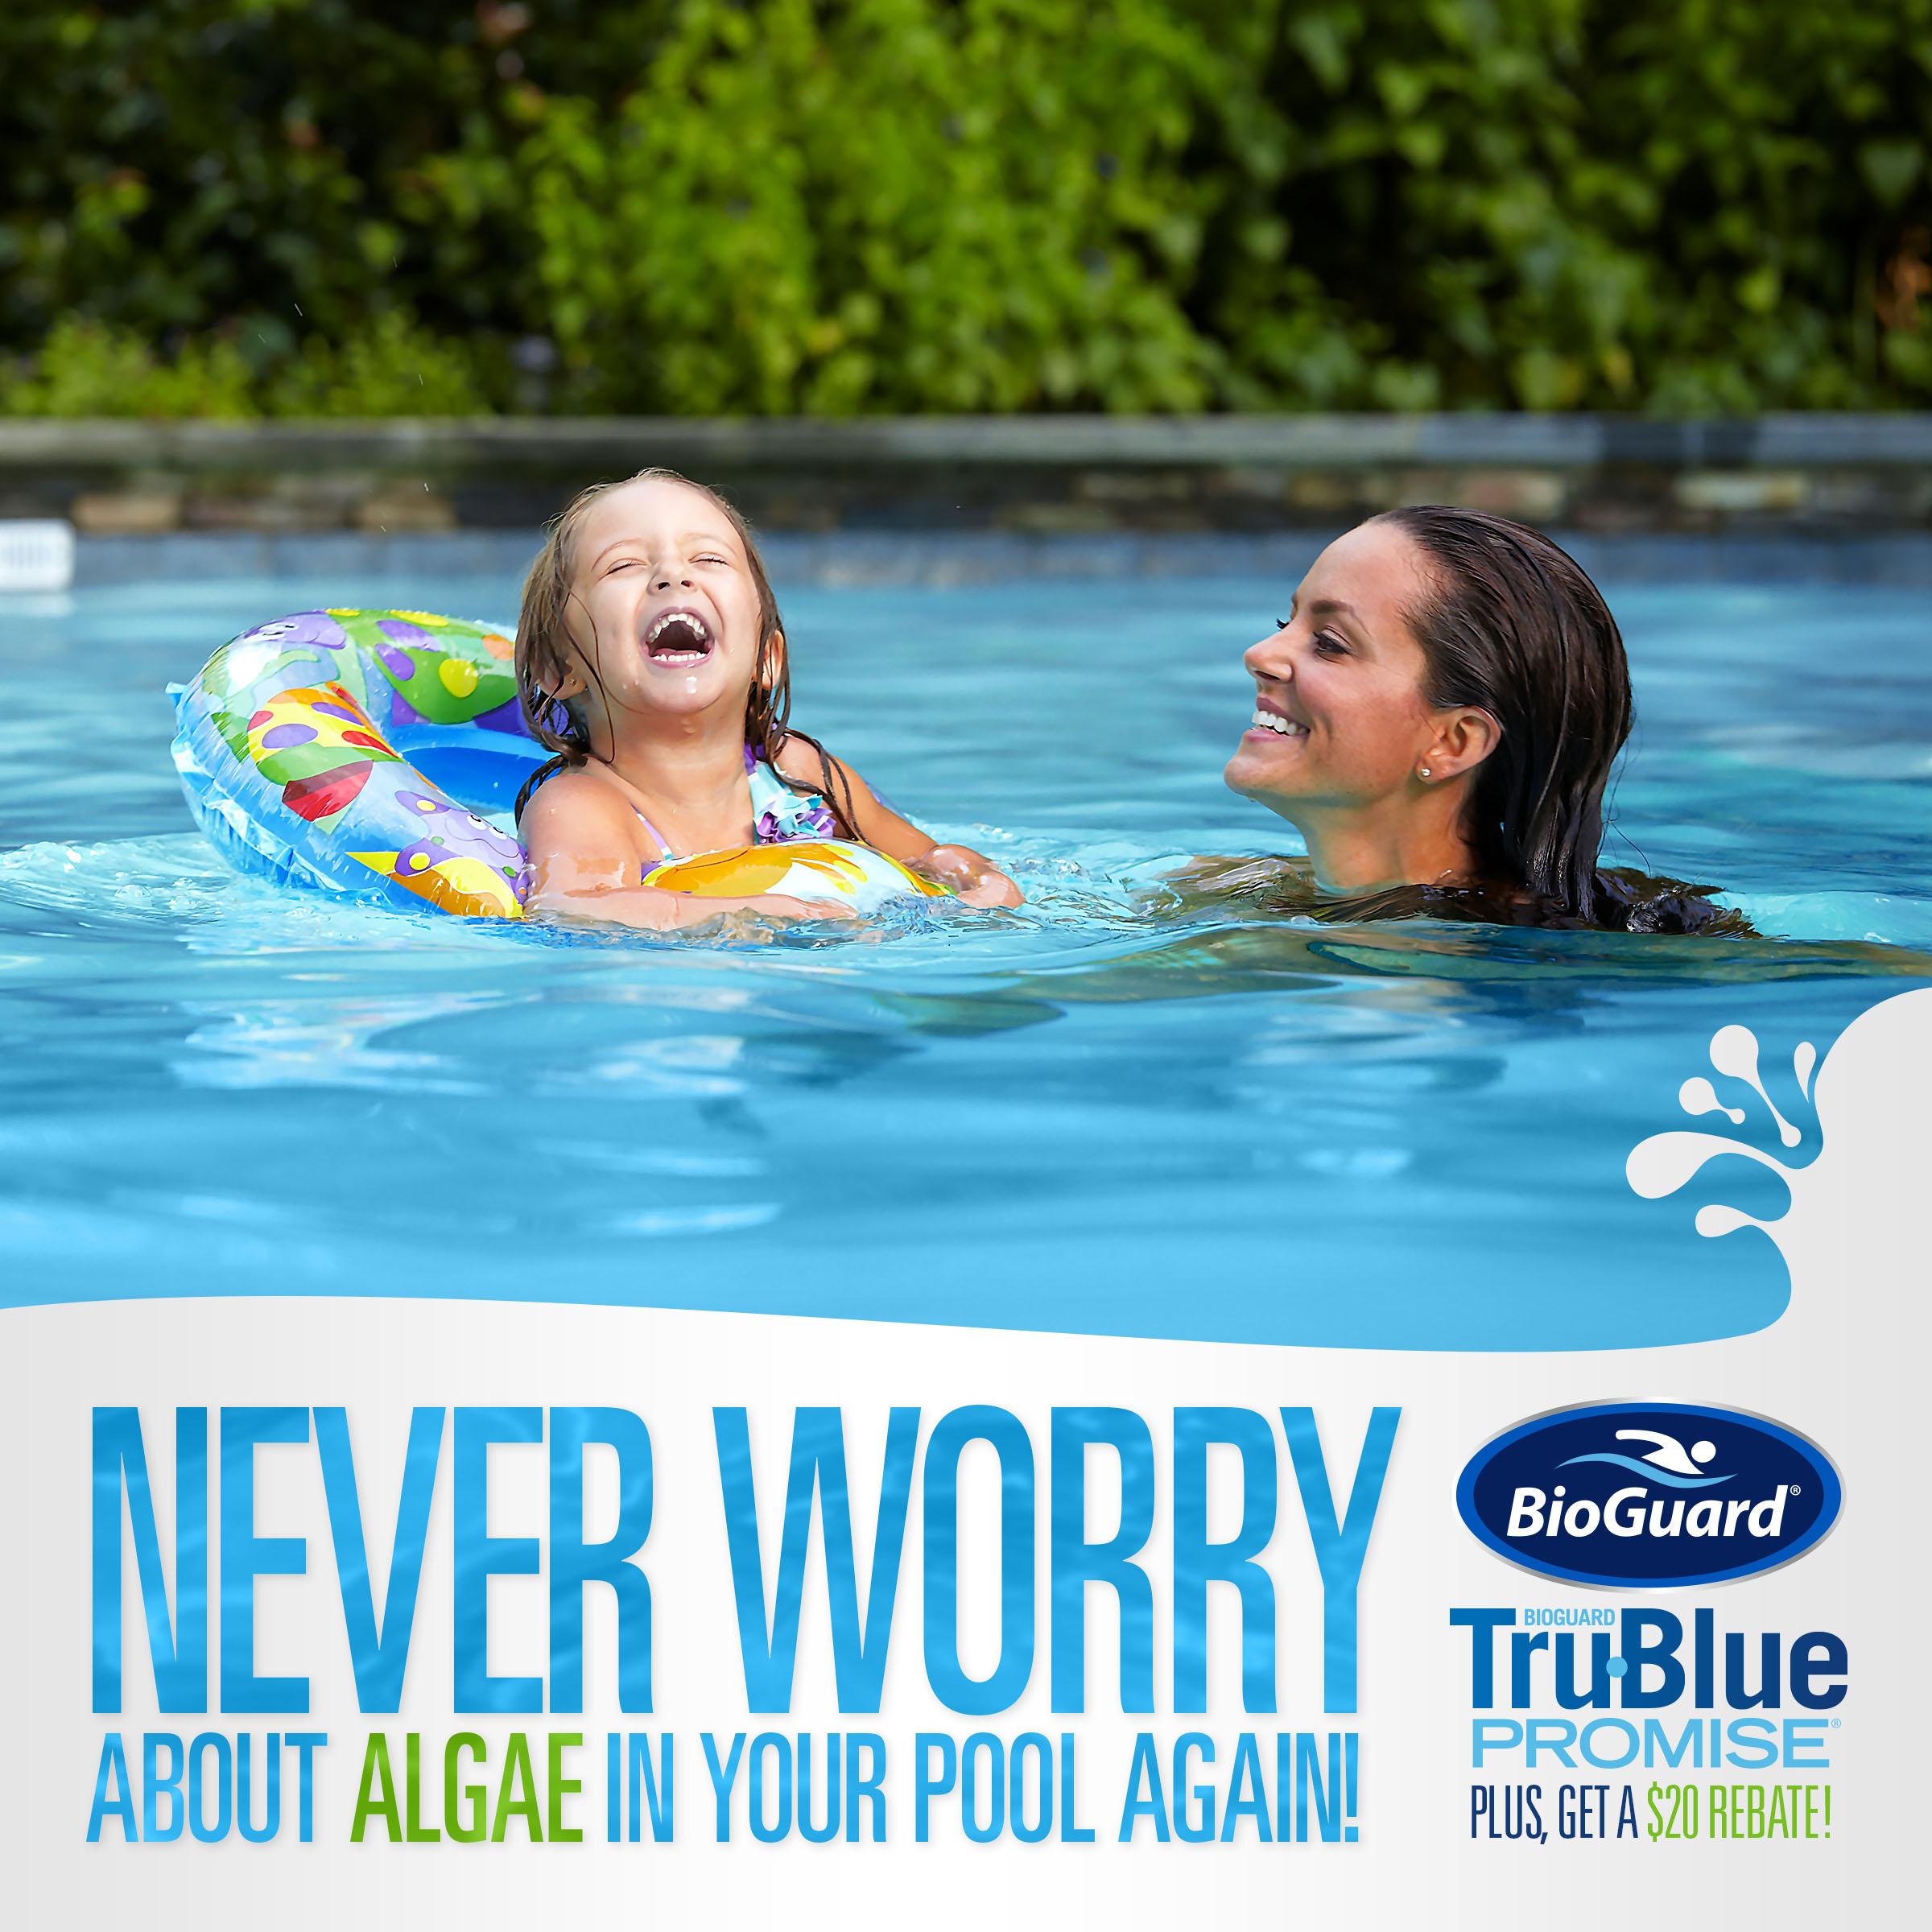 TruBlue Rebate